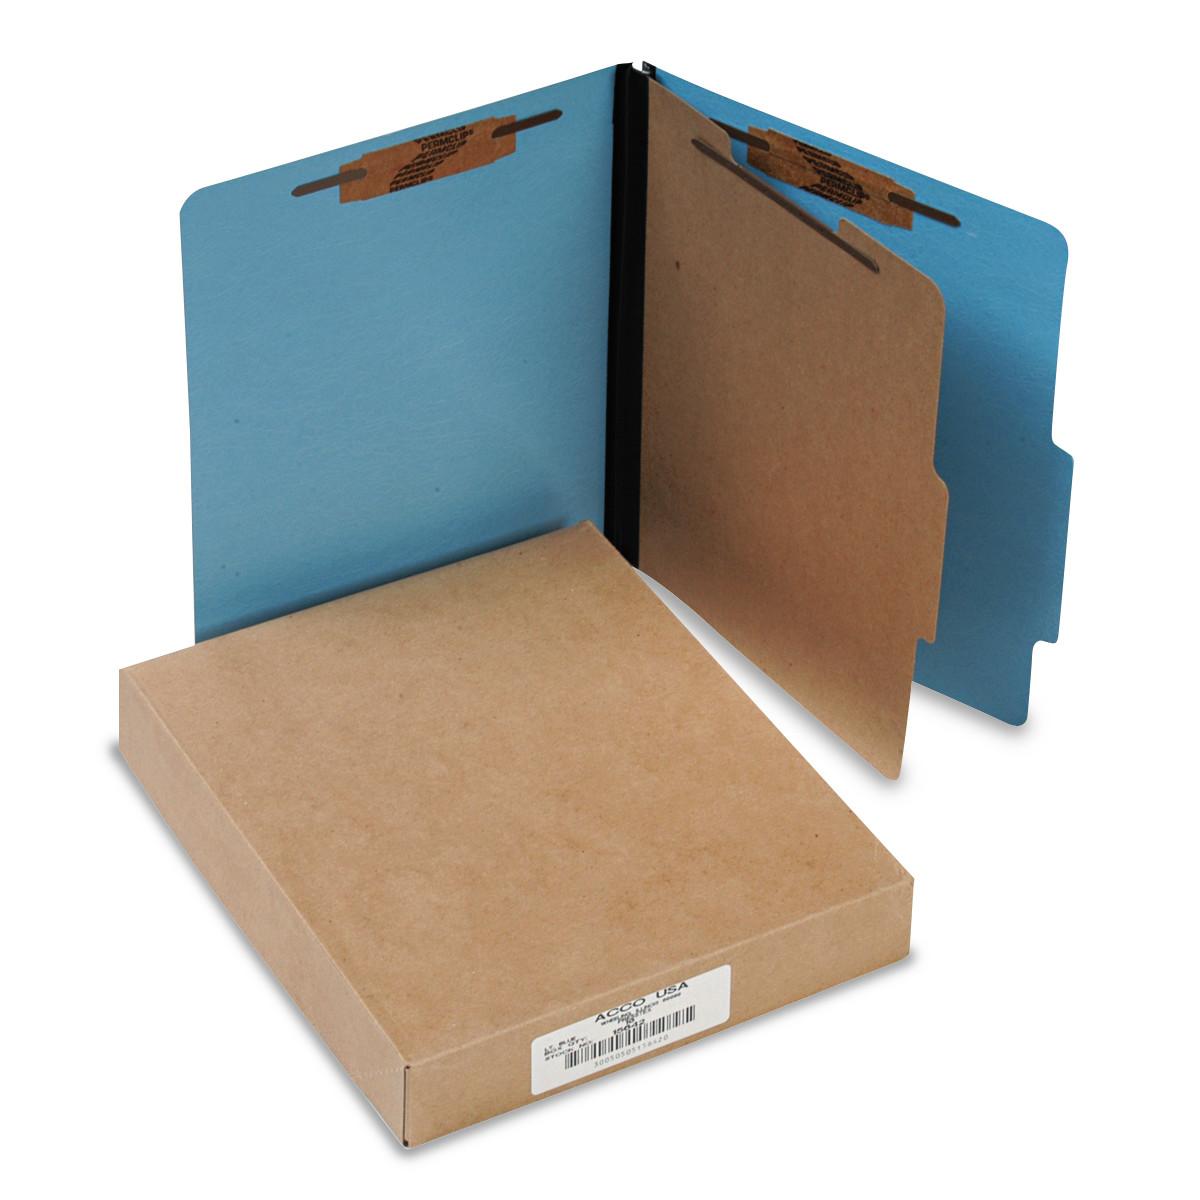 ACCO ColorLife PRESSTEX Classification Folders, Letter, 4-Section, Light Blue, 10/Box